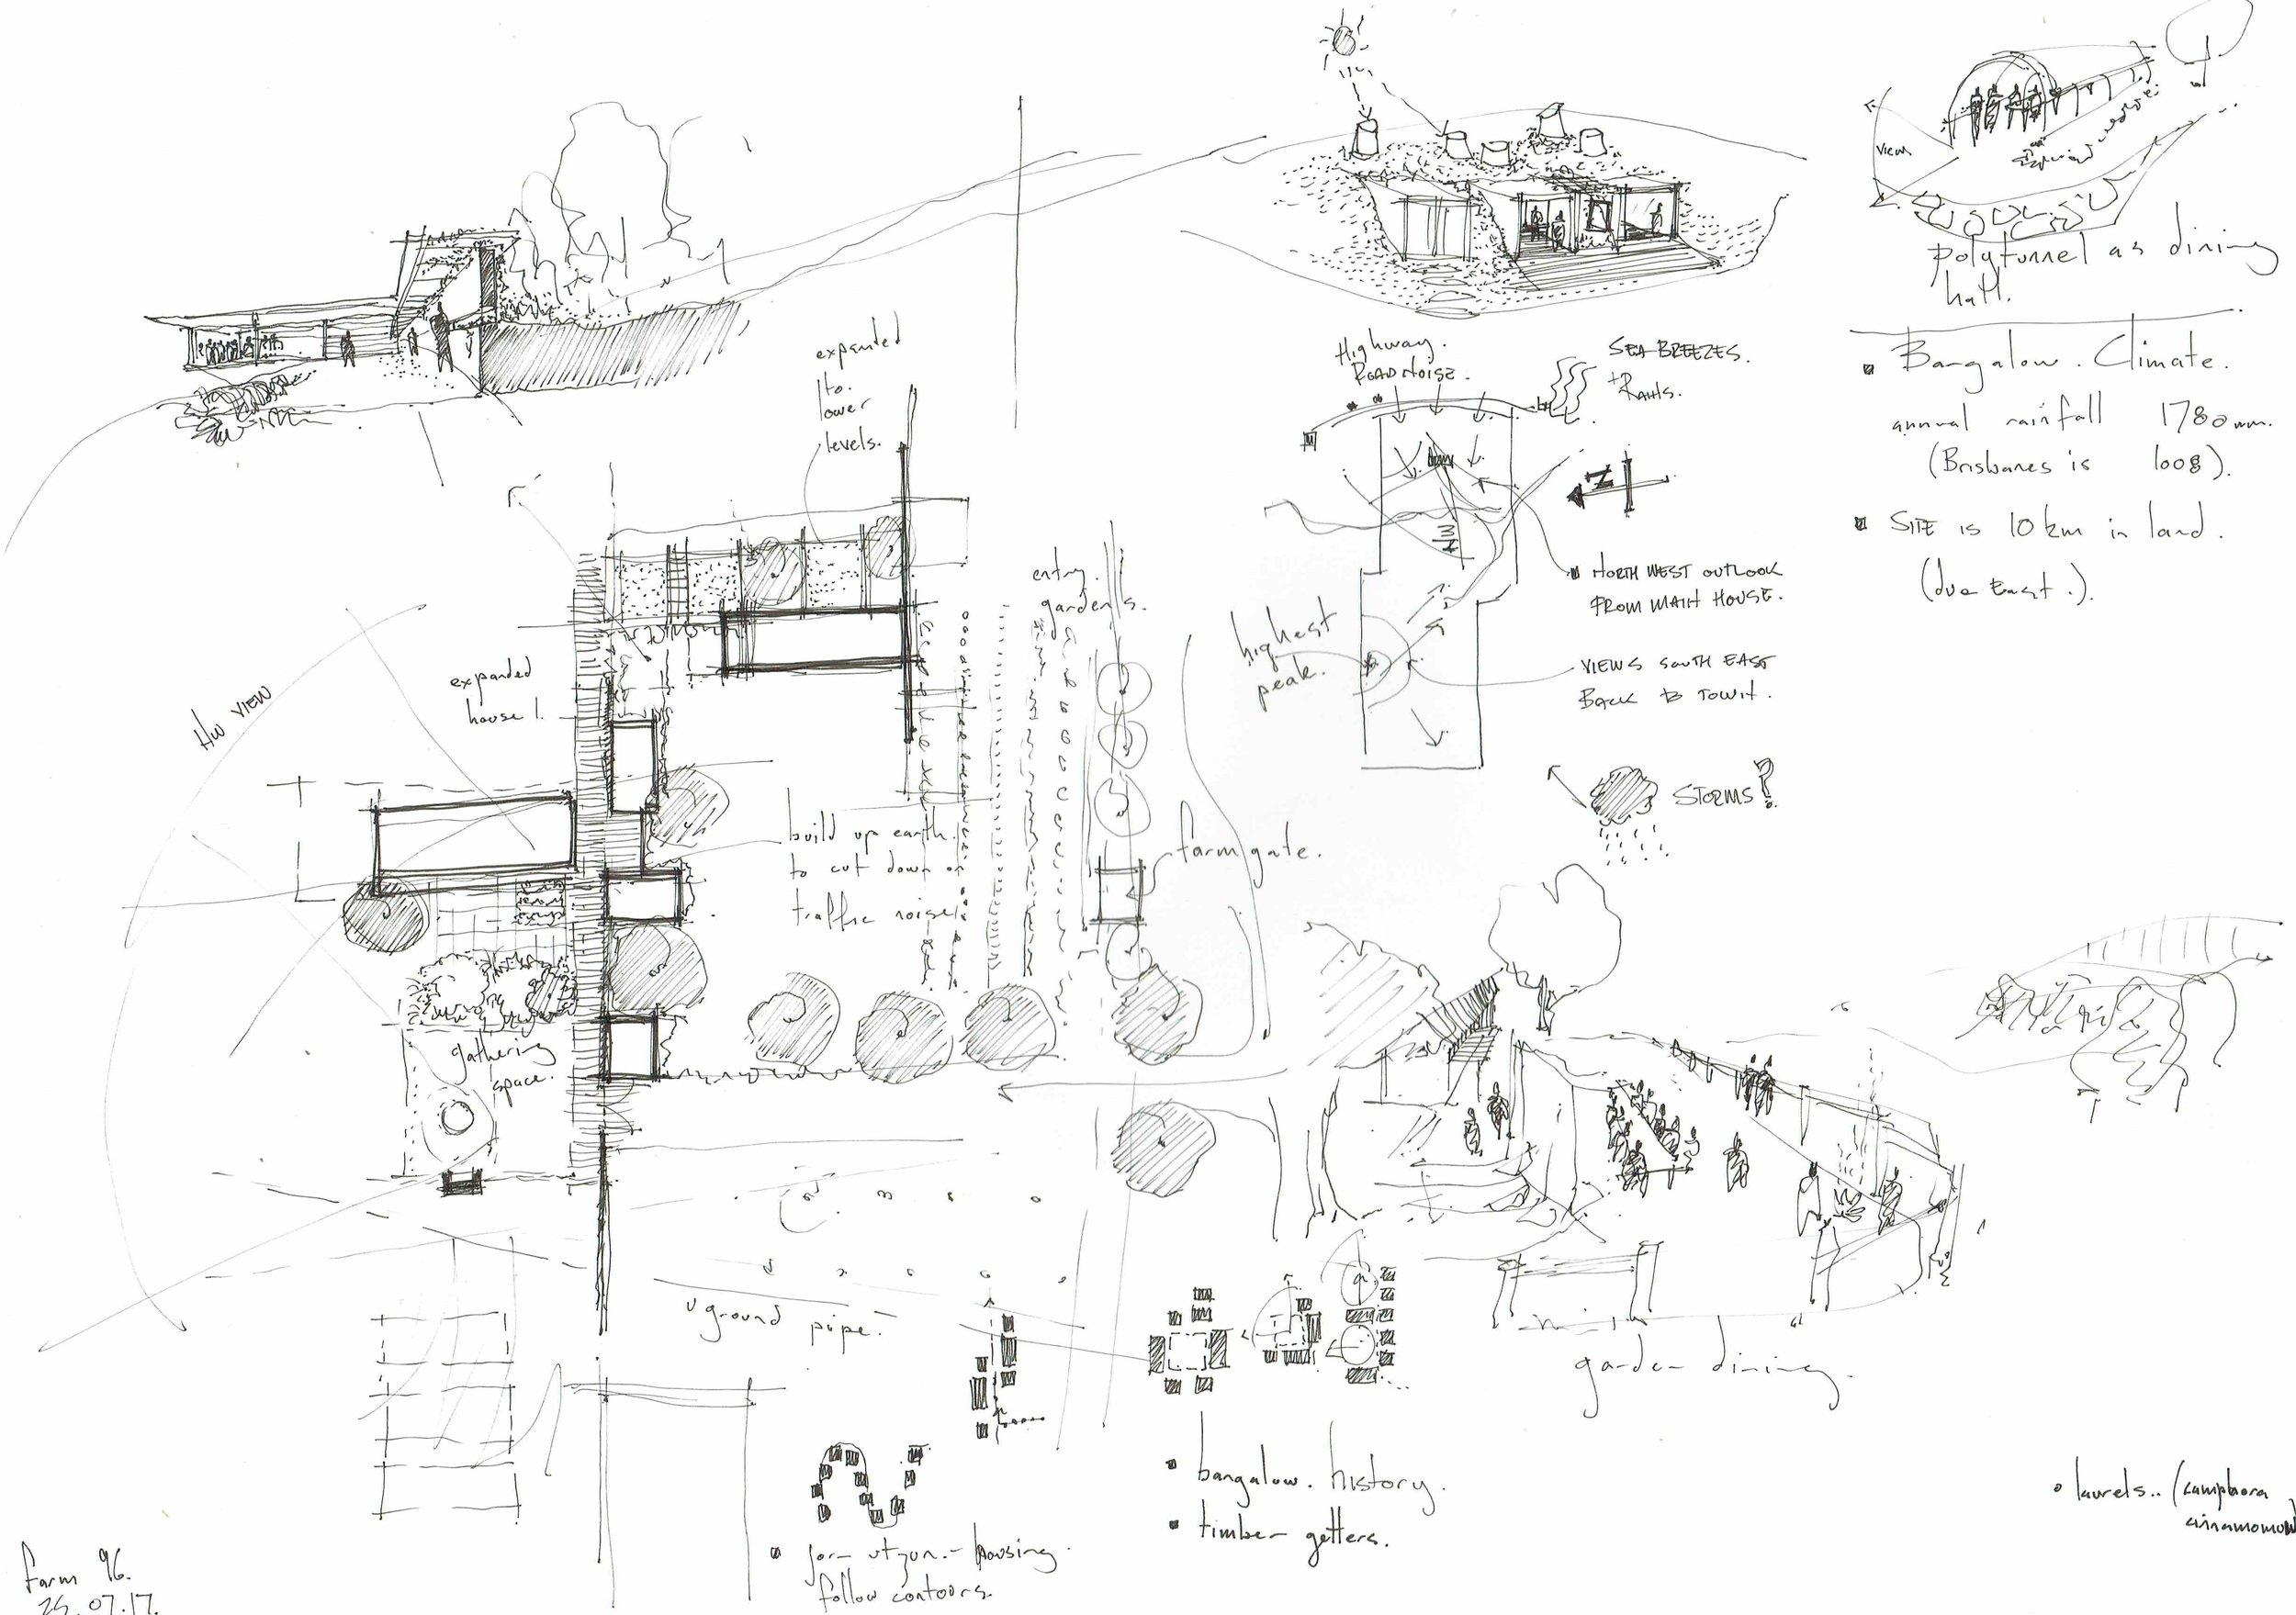 b_sketch1.JPG